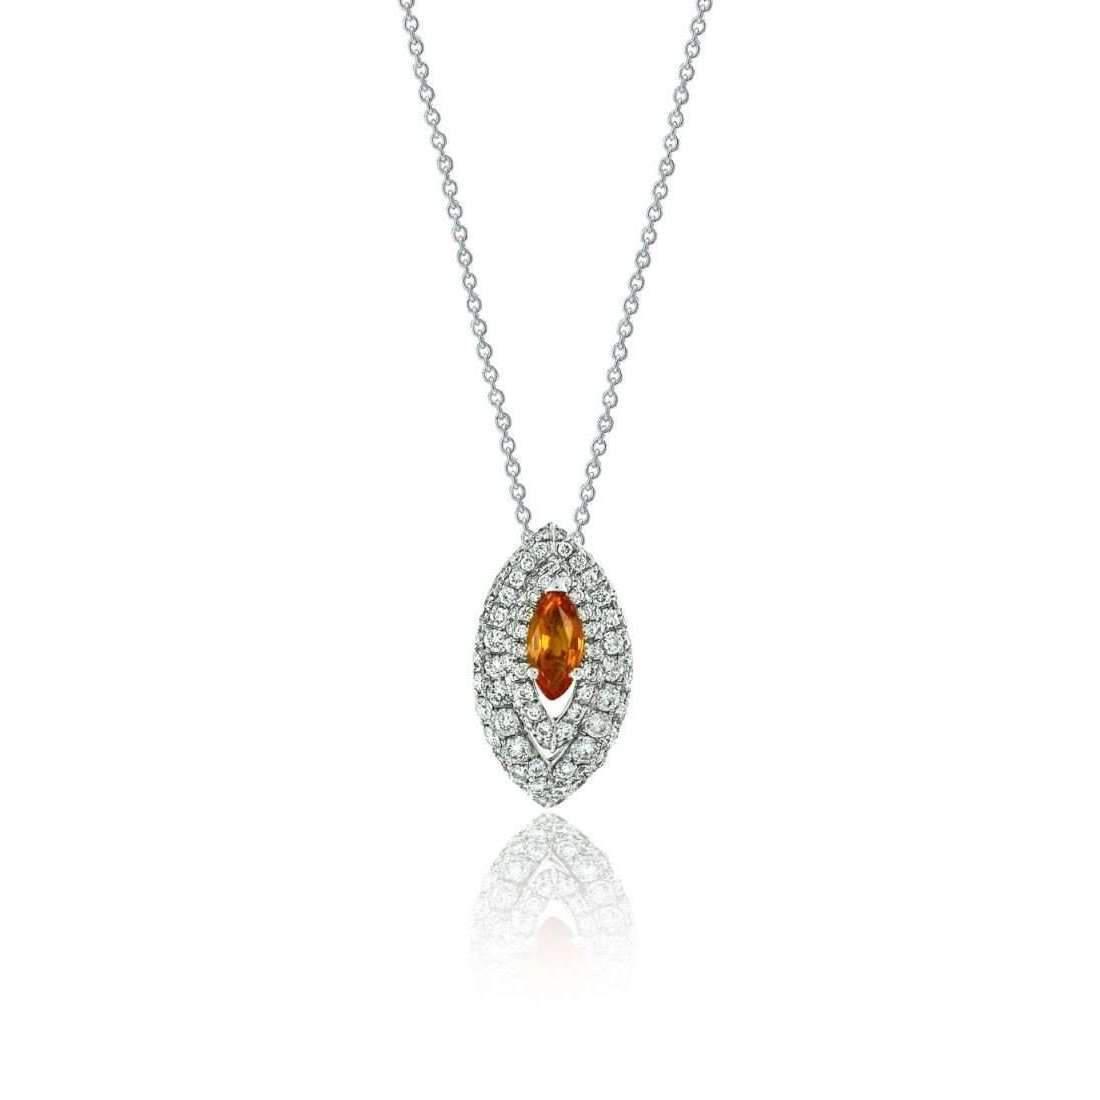 Lyst niquesa fine jewellery amore gemma orange sapphire pendant in niquesa fine jewellery womens metallic amore gemma orange sapphire pendant aloadofball Image collections